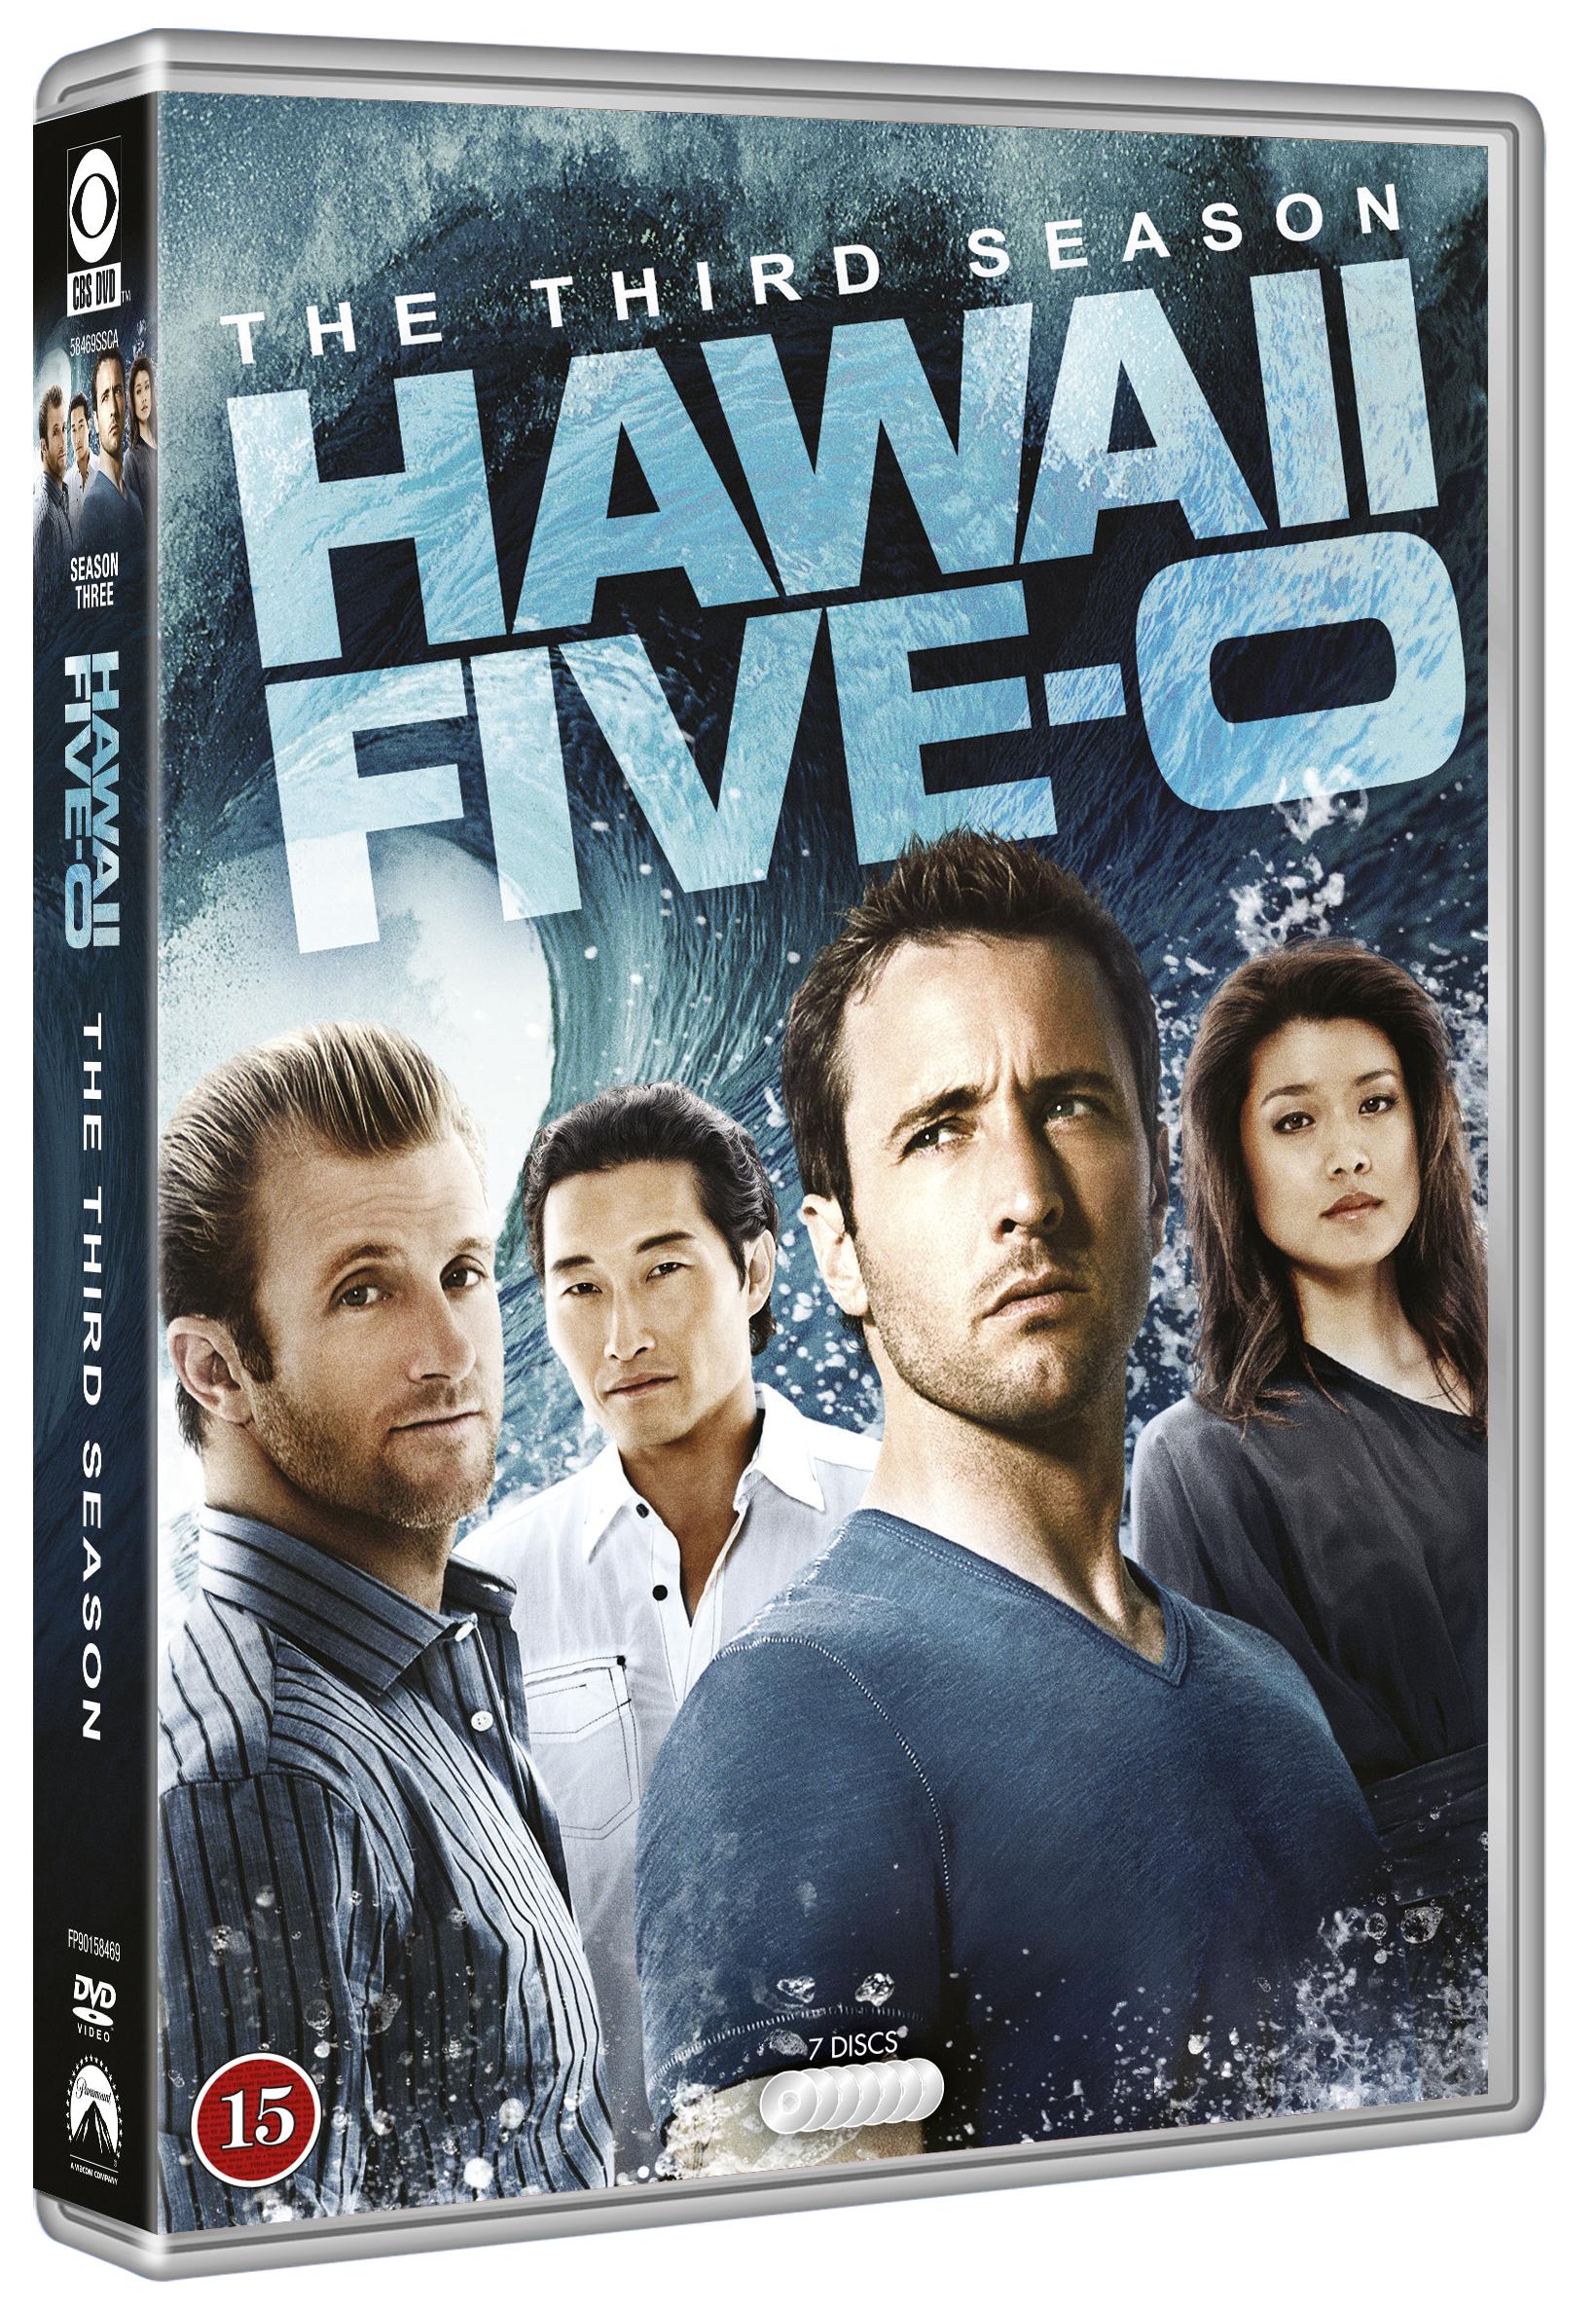 Hawaii Five-0 - Season 3 - DVD